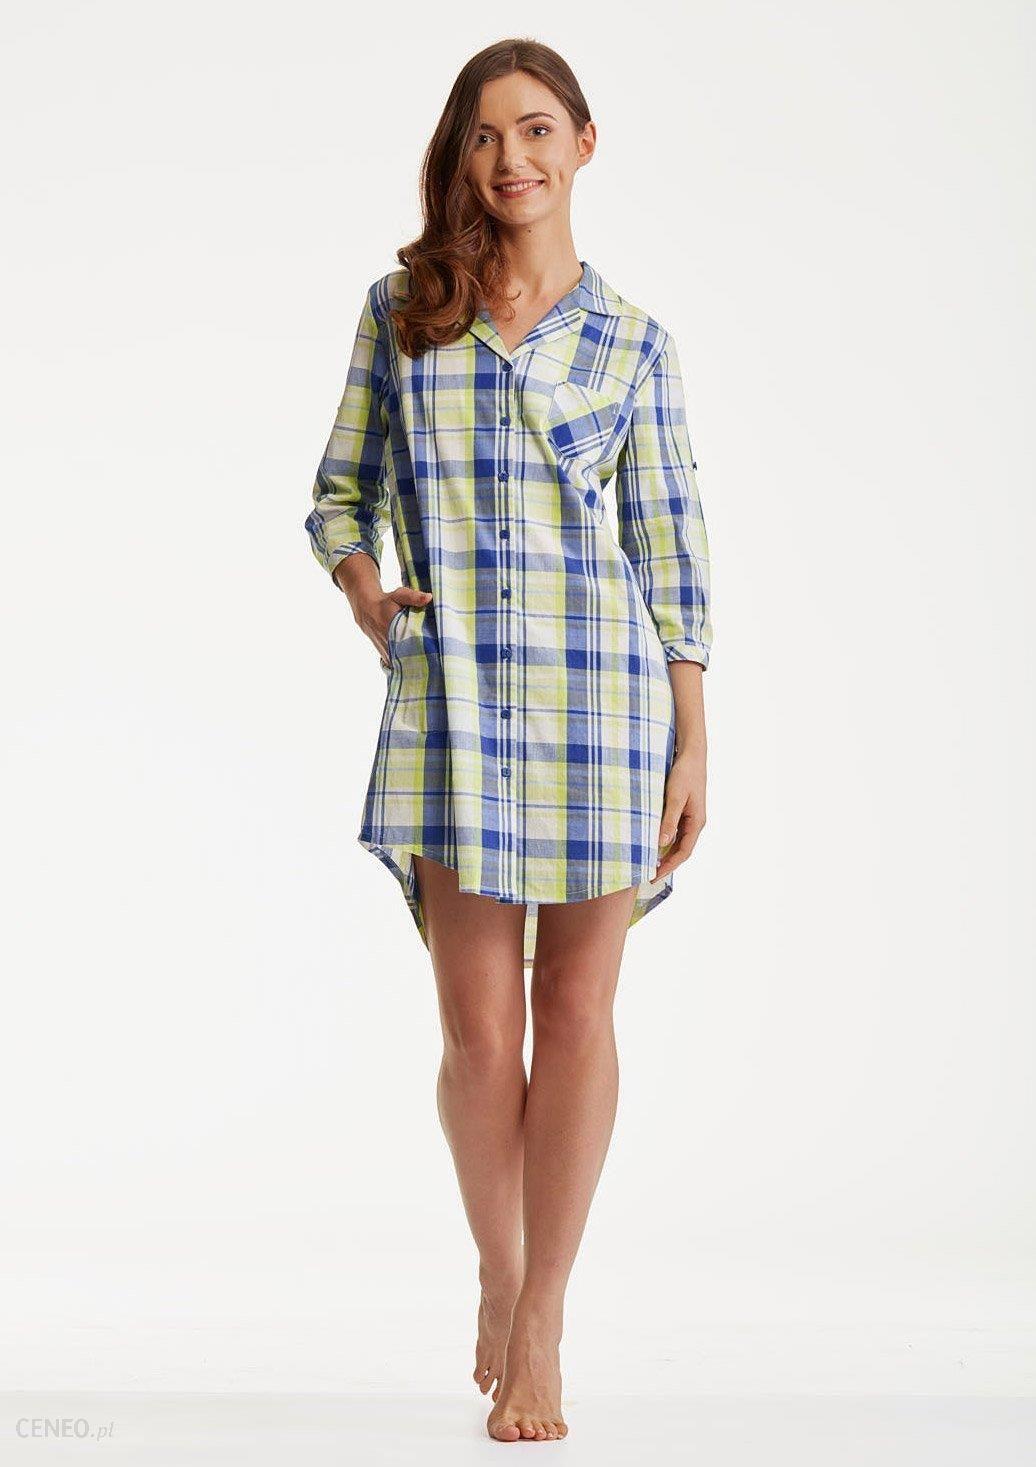 9a9e1a709d20f8 Key Lhd 470 A8 Koszula Nocna Damska Homewear Niebi - Ceny i opinie ...